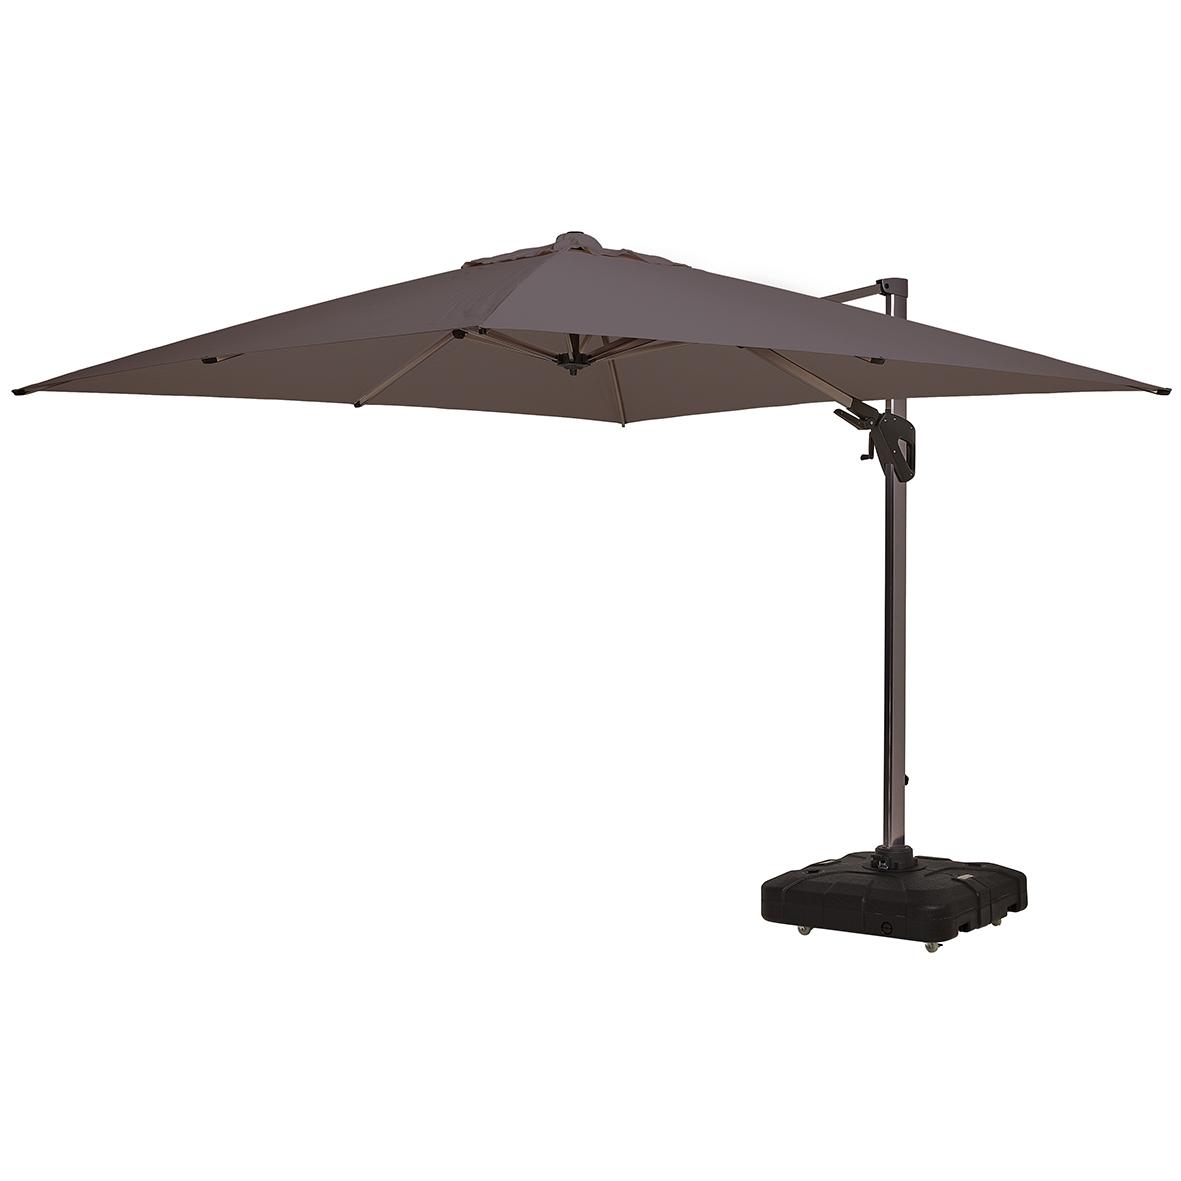 Umbrella Stand Bunnings: Melaleuca 3m Square Cantilever Umbrella